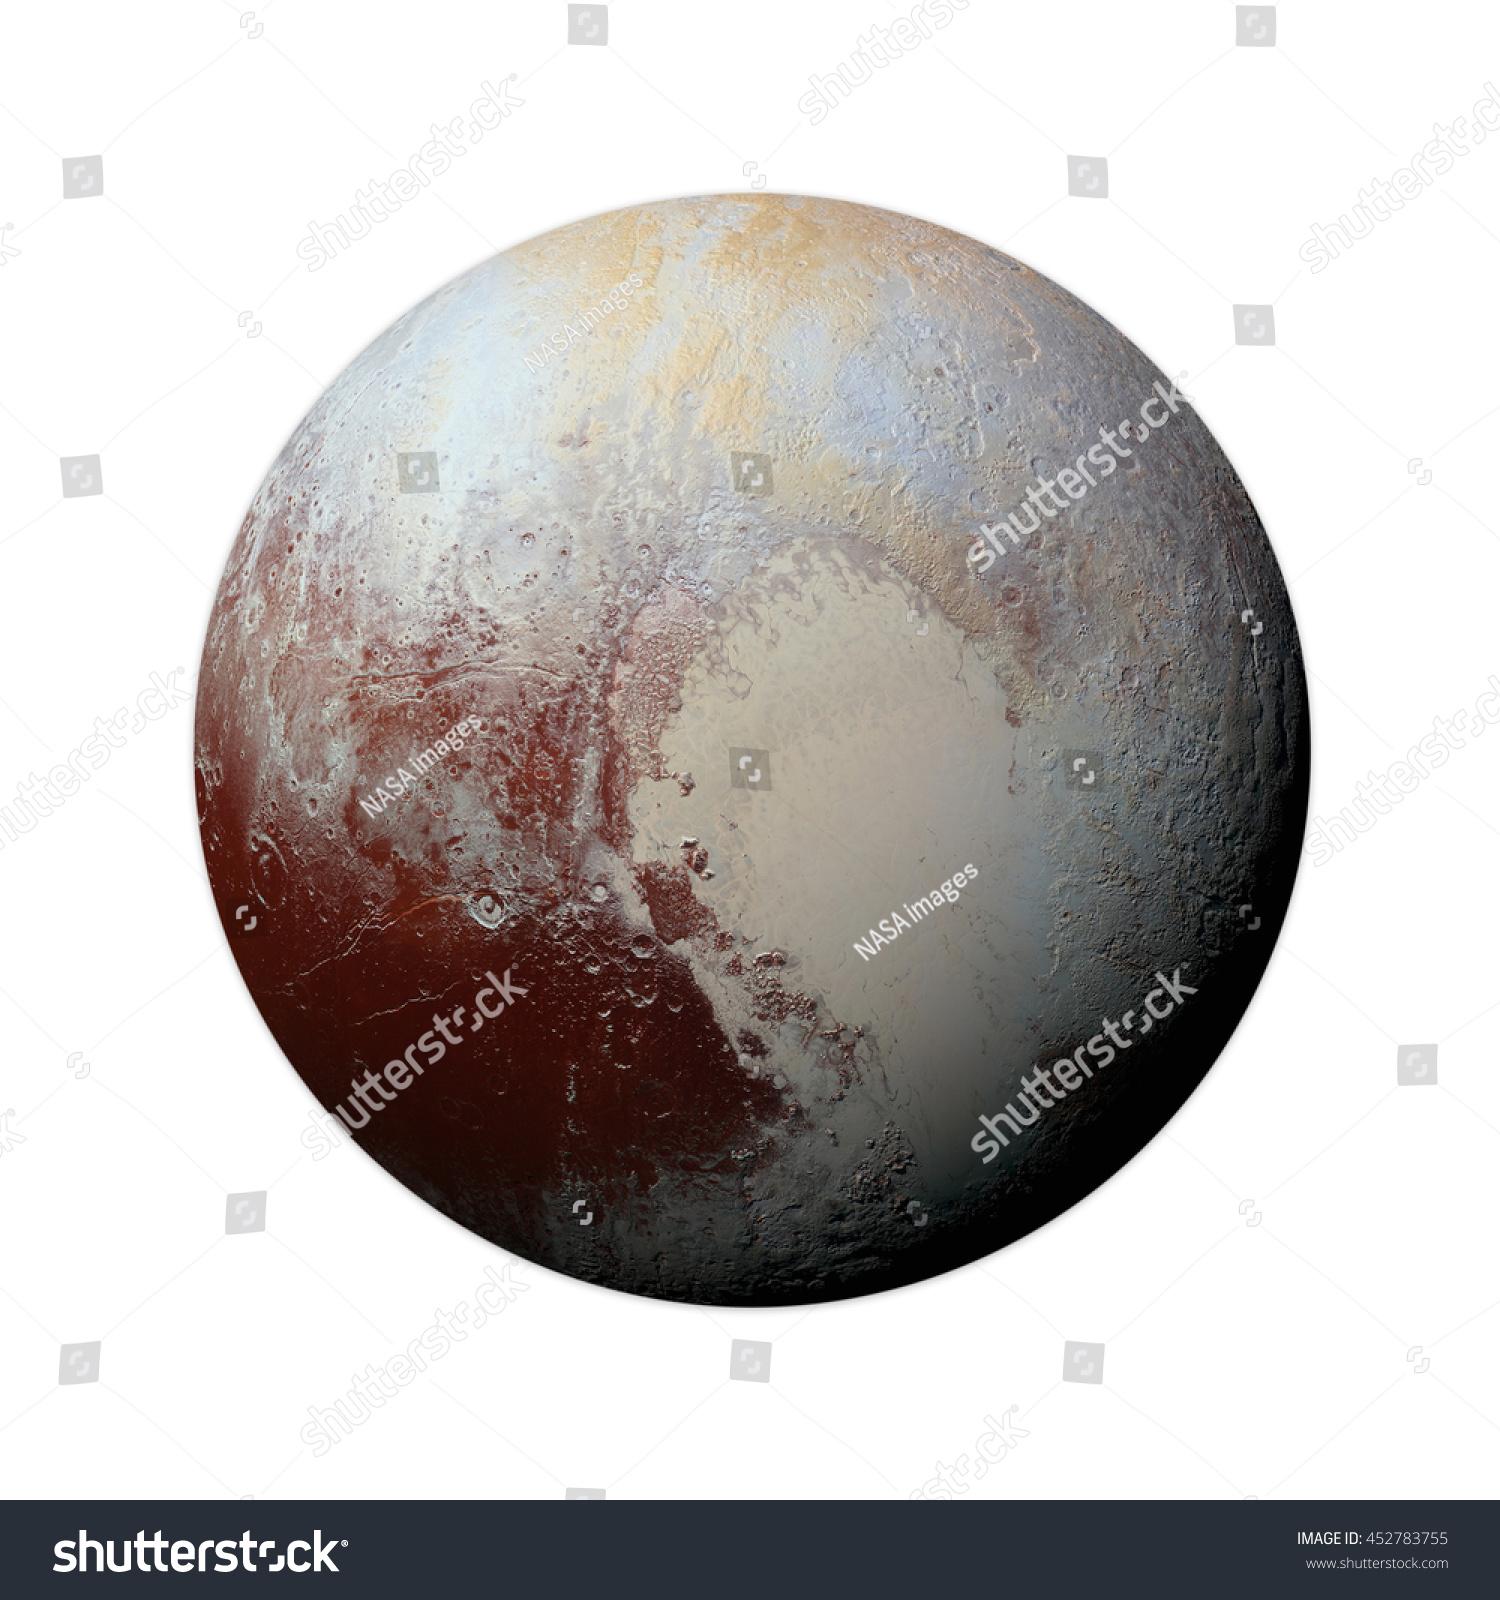 elements present on planet pluto - photo #5